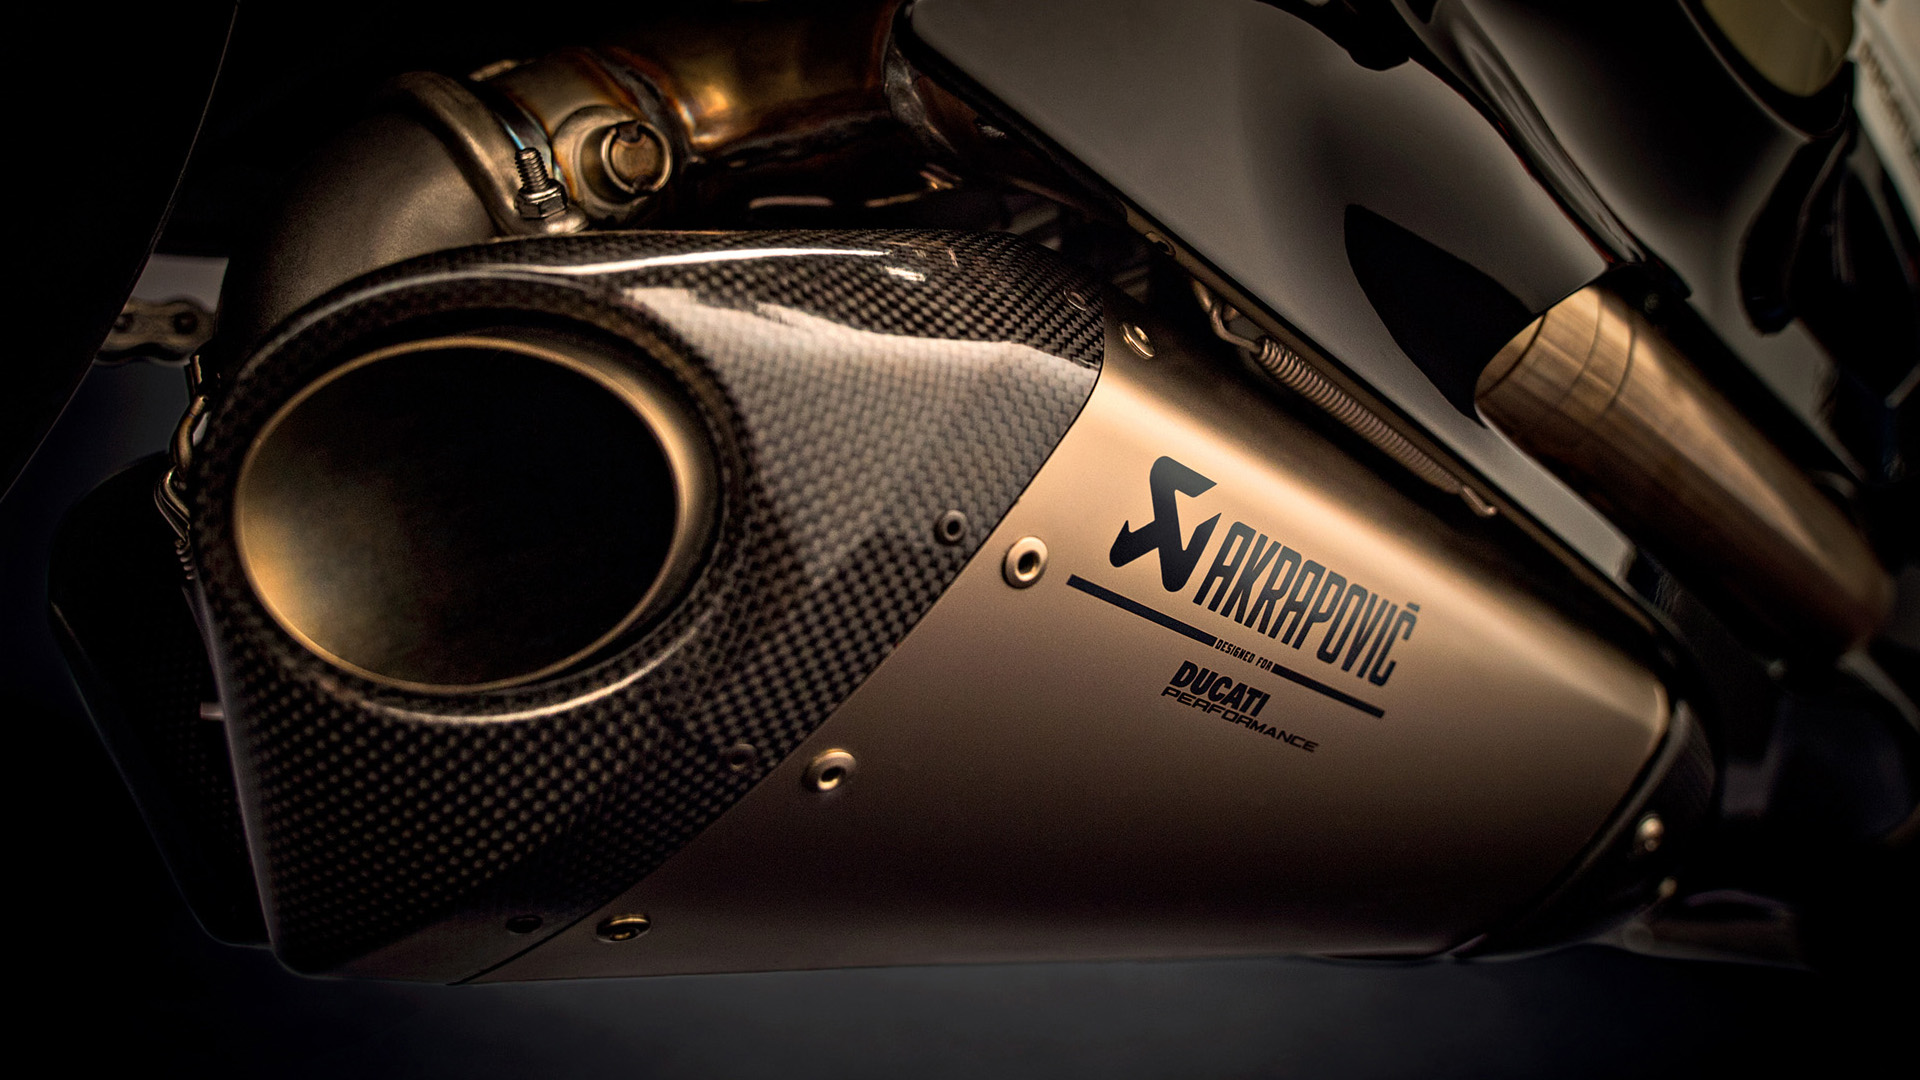 superbike full hd images